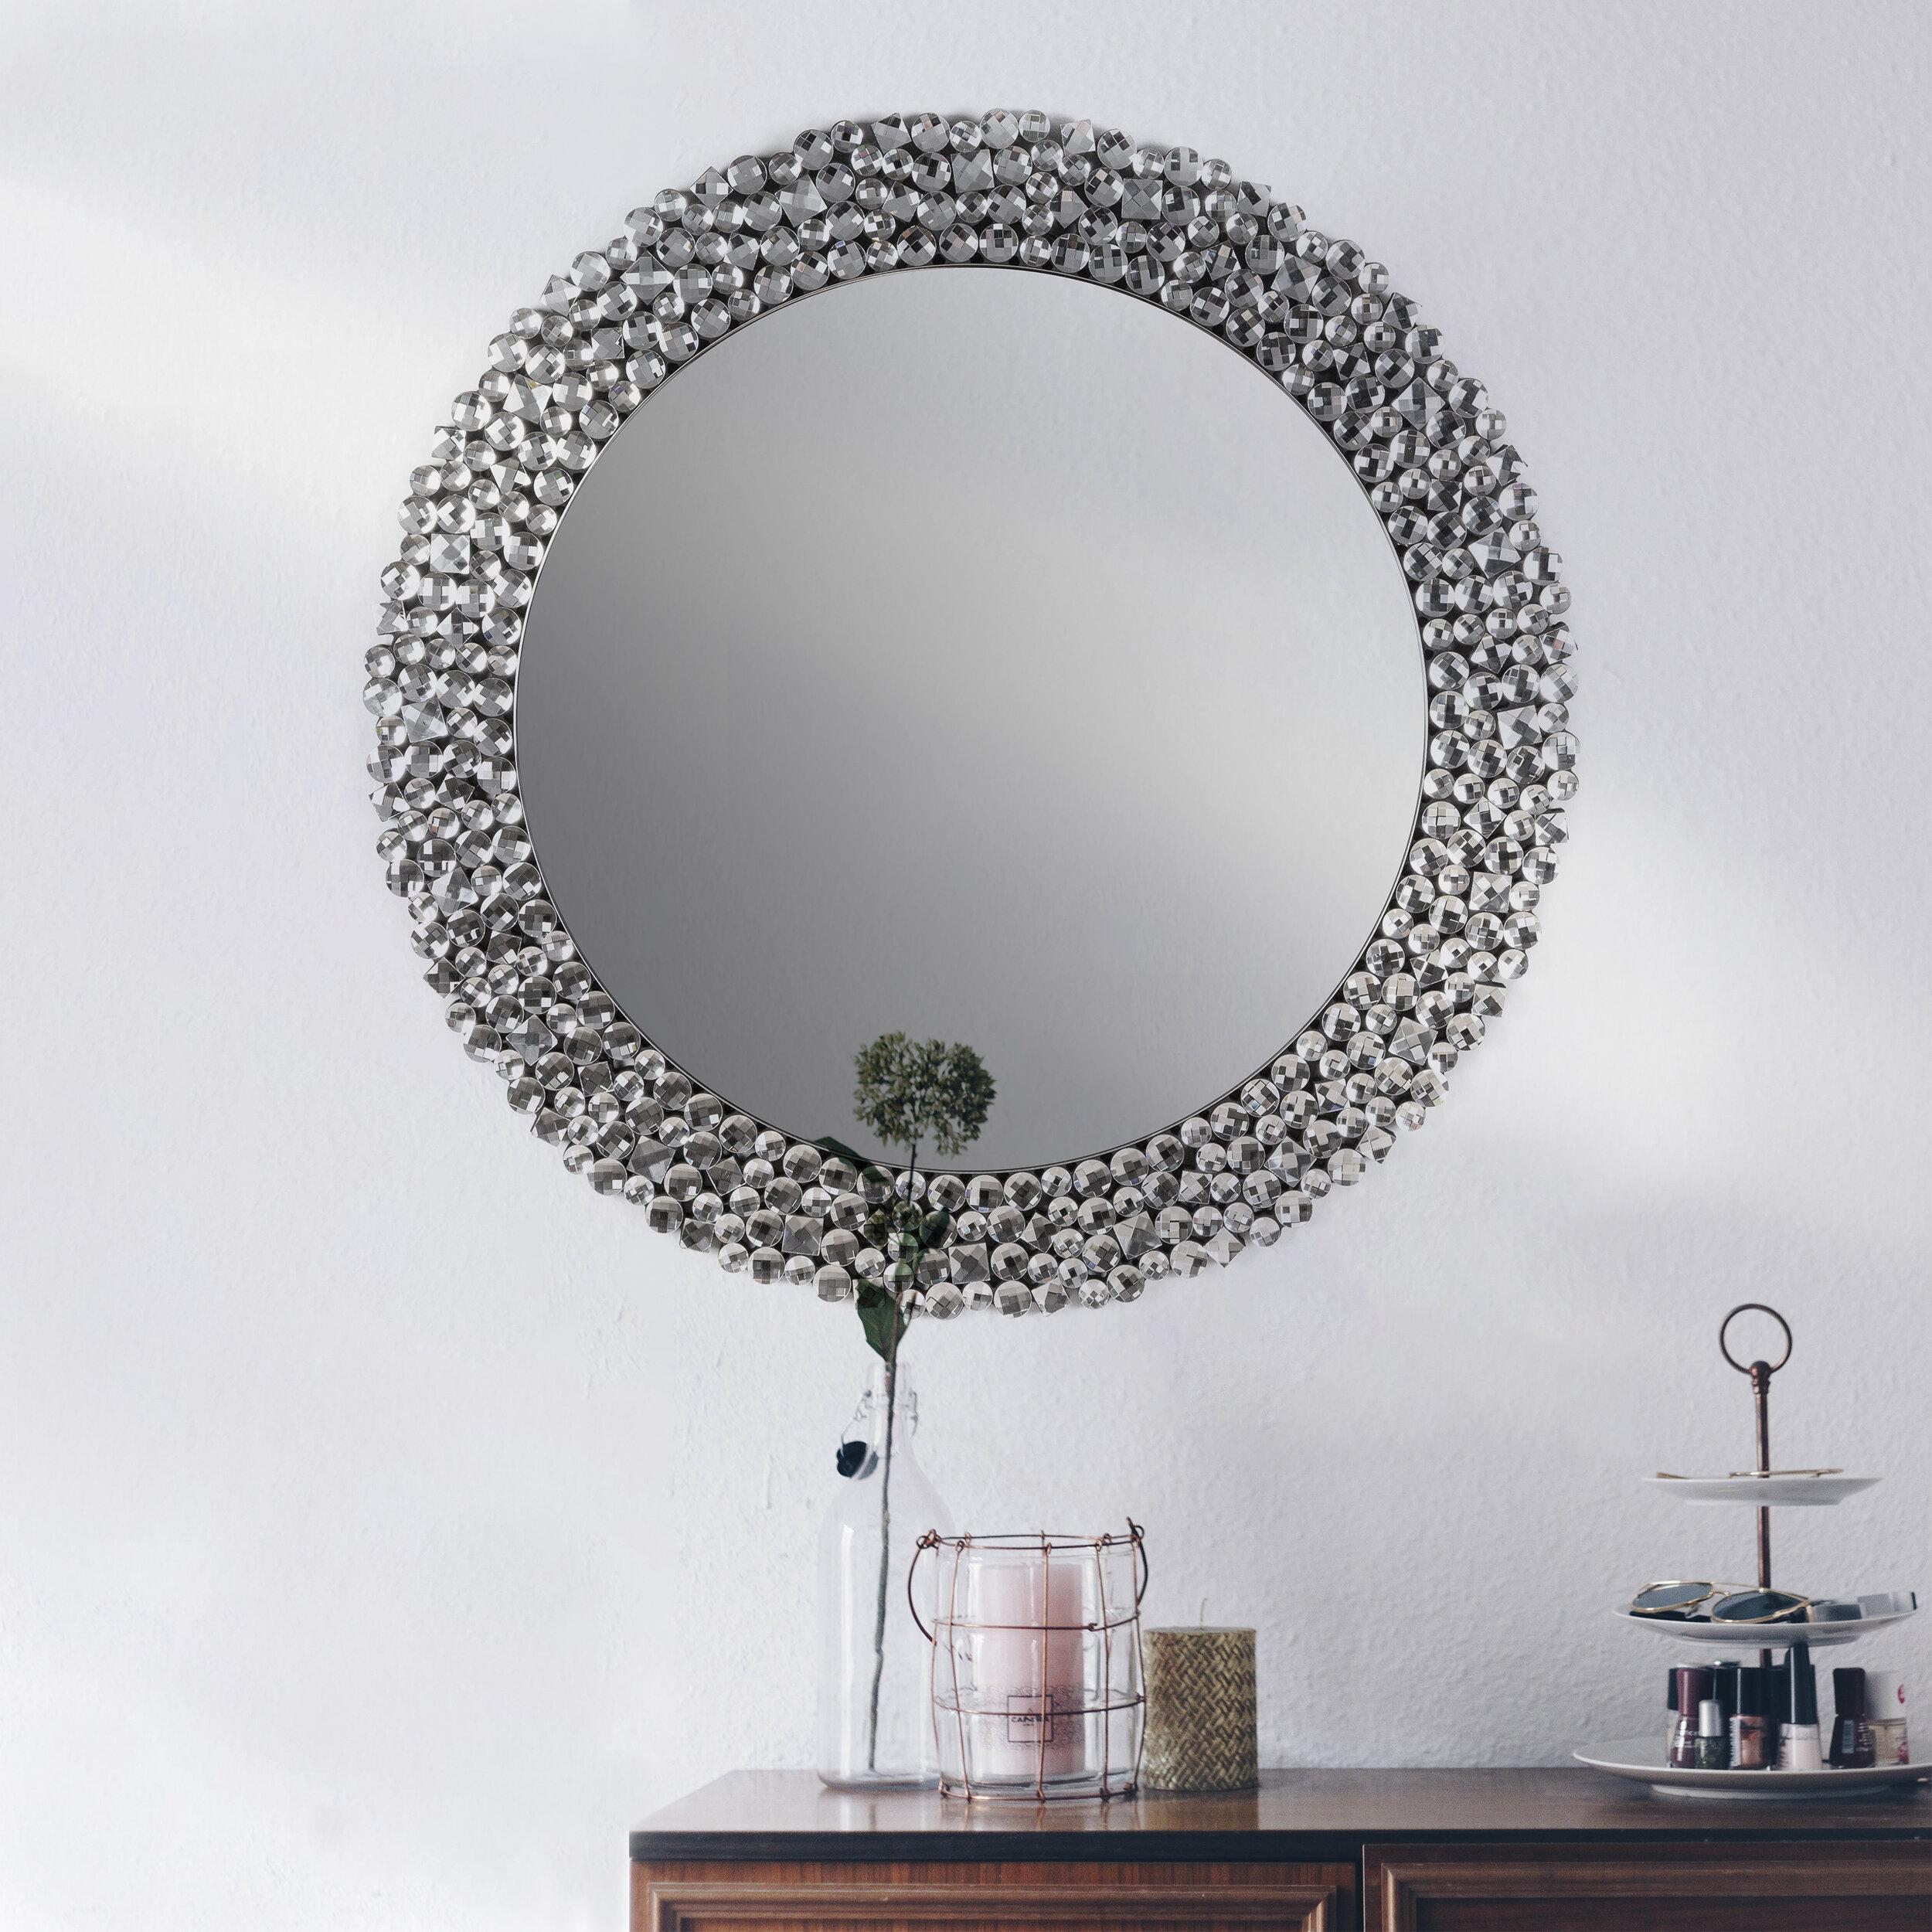 Pedigo Beveled Venetian Wall Mirror Pertaining To Point Reyes Molten Round Wall Mirrors (View 20 of 20)